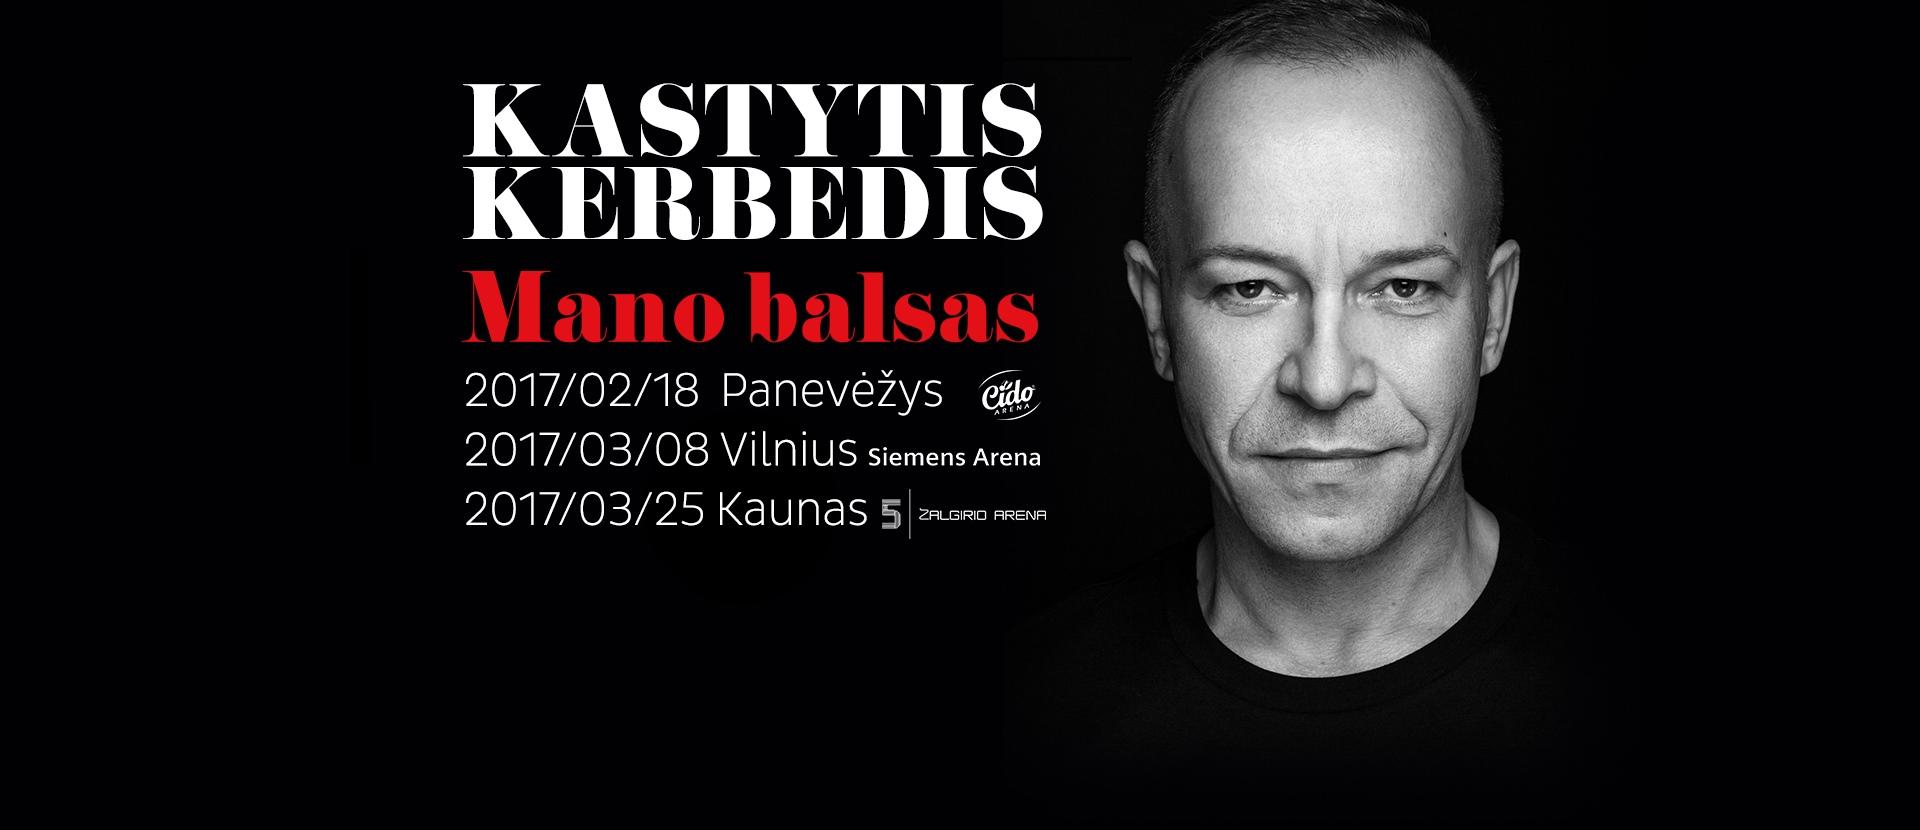 KASTYTIS KERBEDIS | MANO BALSAS